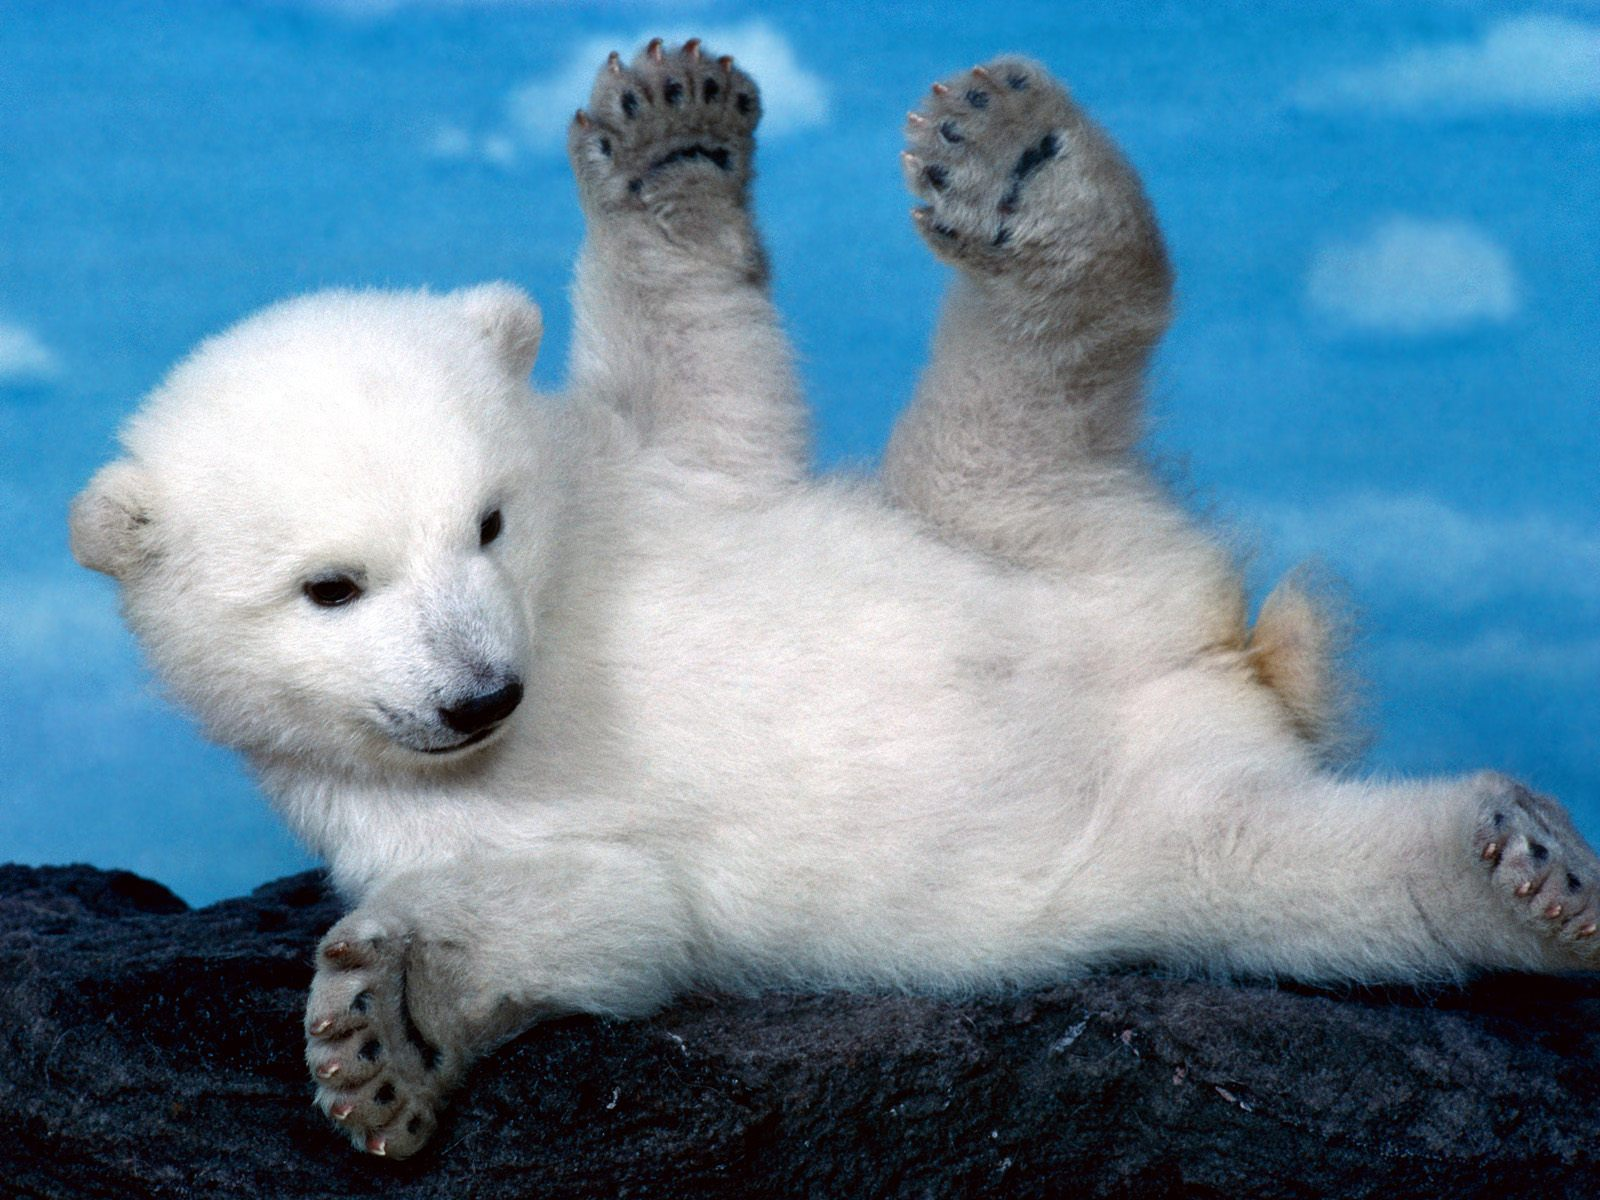 http://1.bp.blogspot.com/-RVce82lHD8g/TZjT4cIuGgI/AAAAAAAAAAM/5TaTiobWZmA/s1600/Wallpapers_de_animales_osos_polares_3.jpg